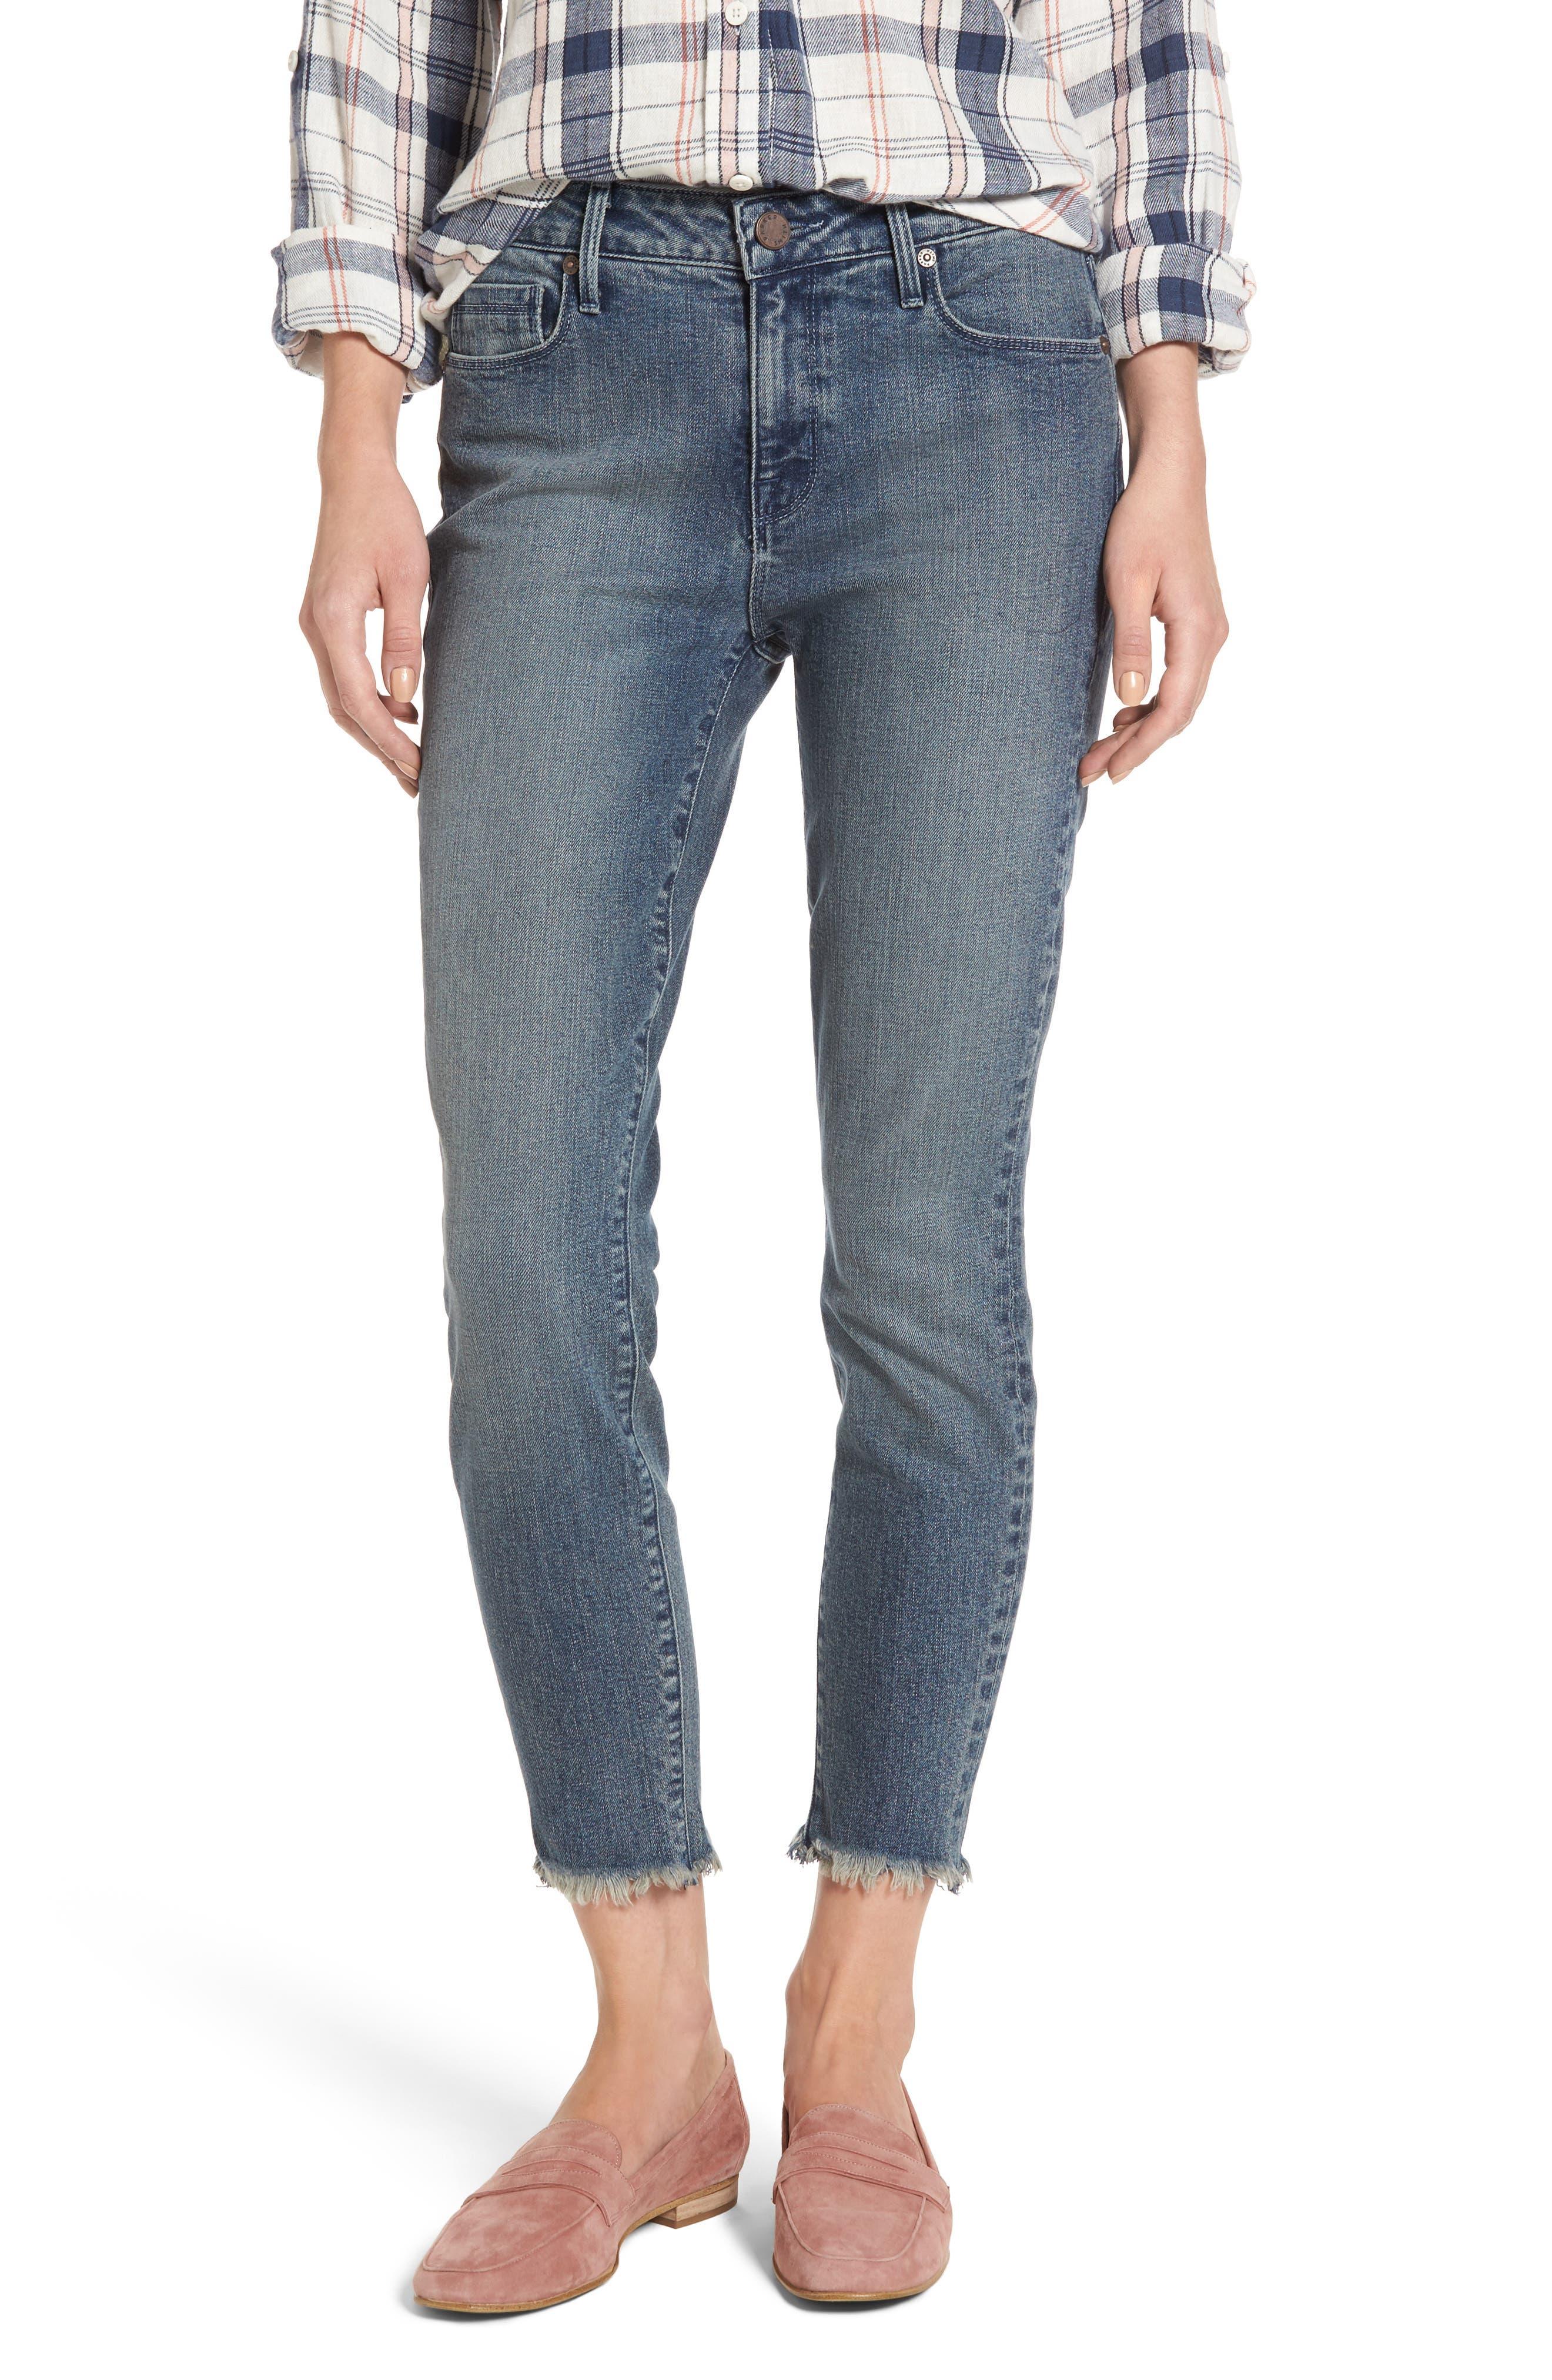 Main Image - PARKER SMITH Ava Crop Skinny Jeans (Madeline)